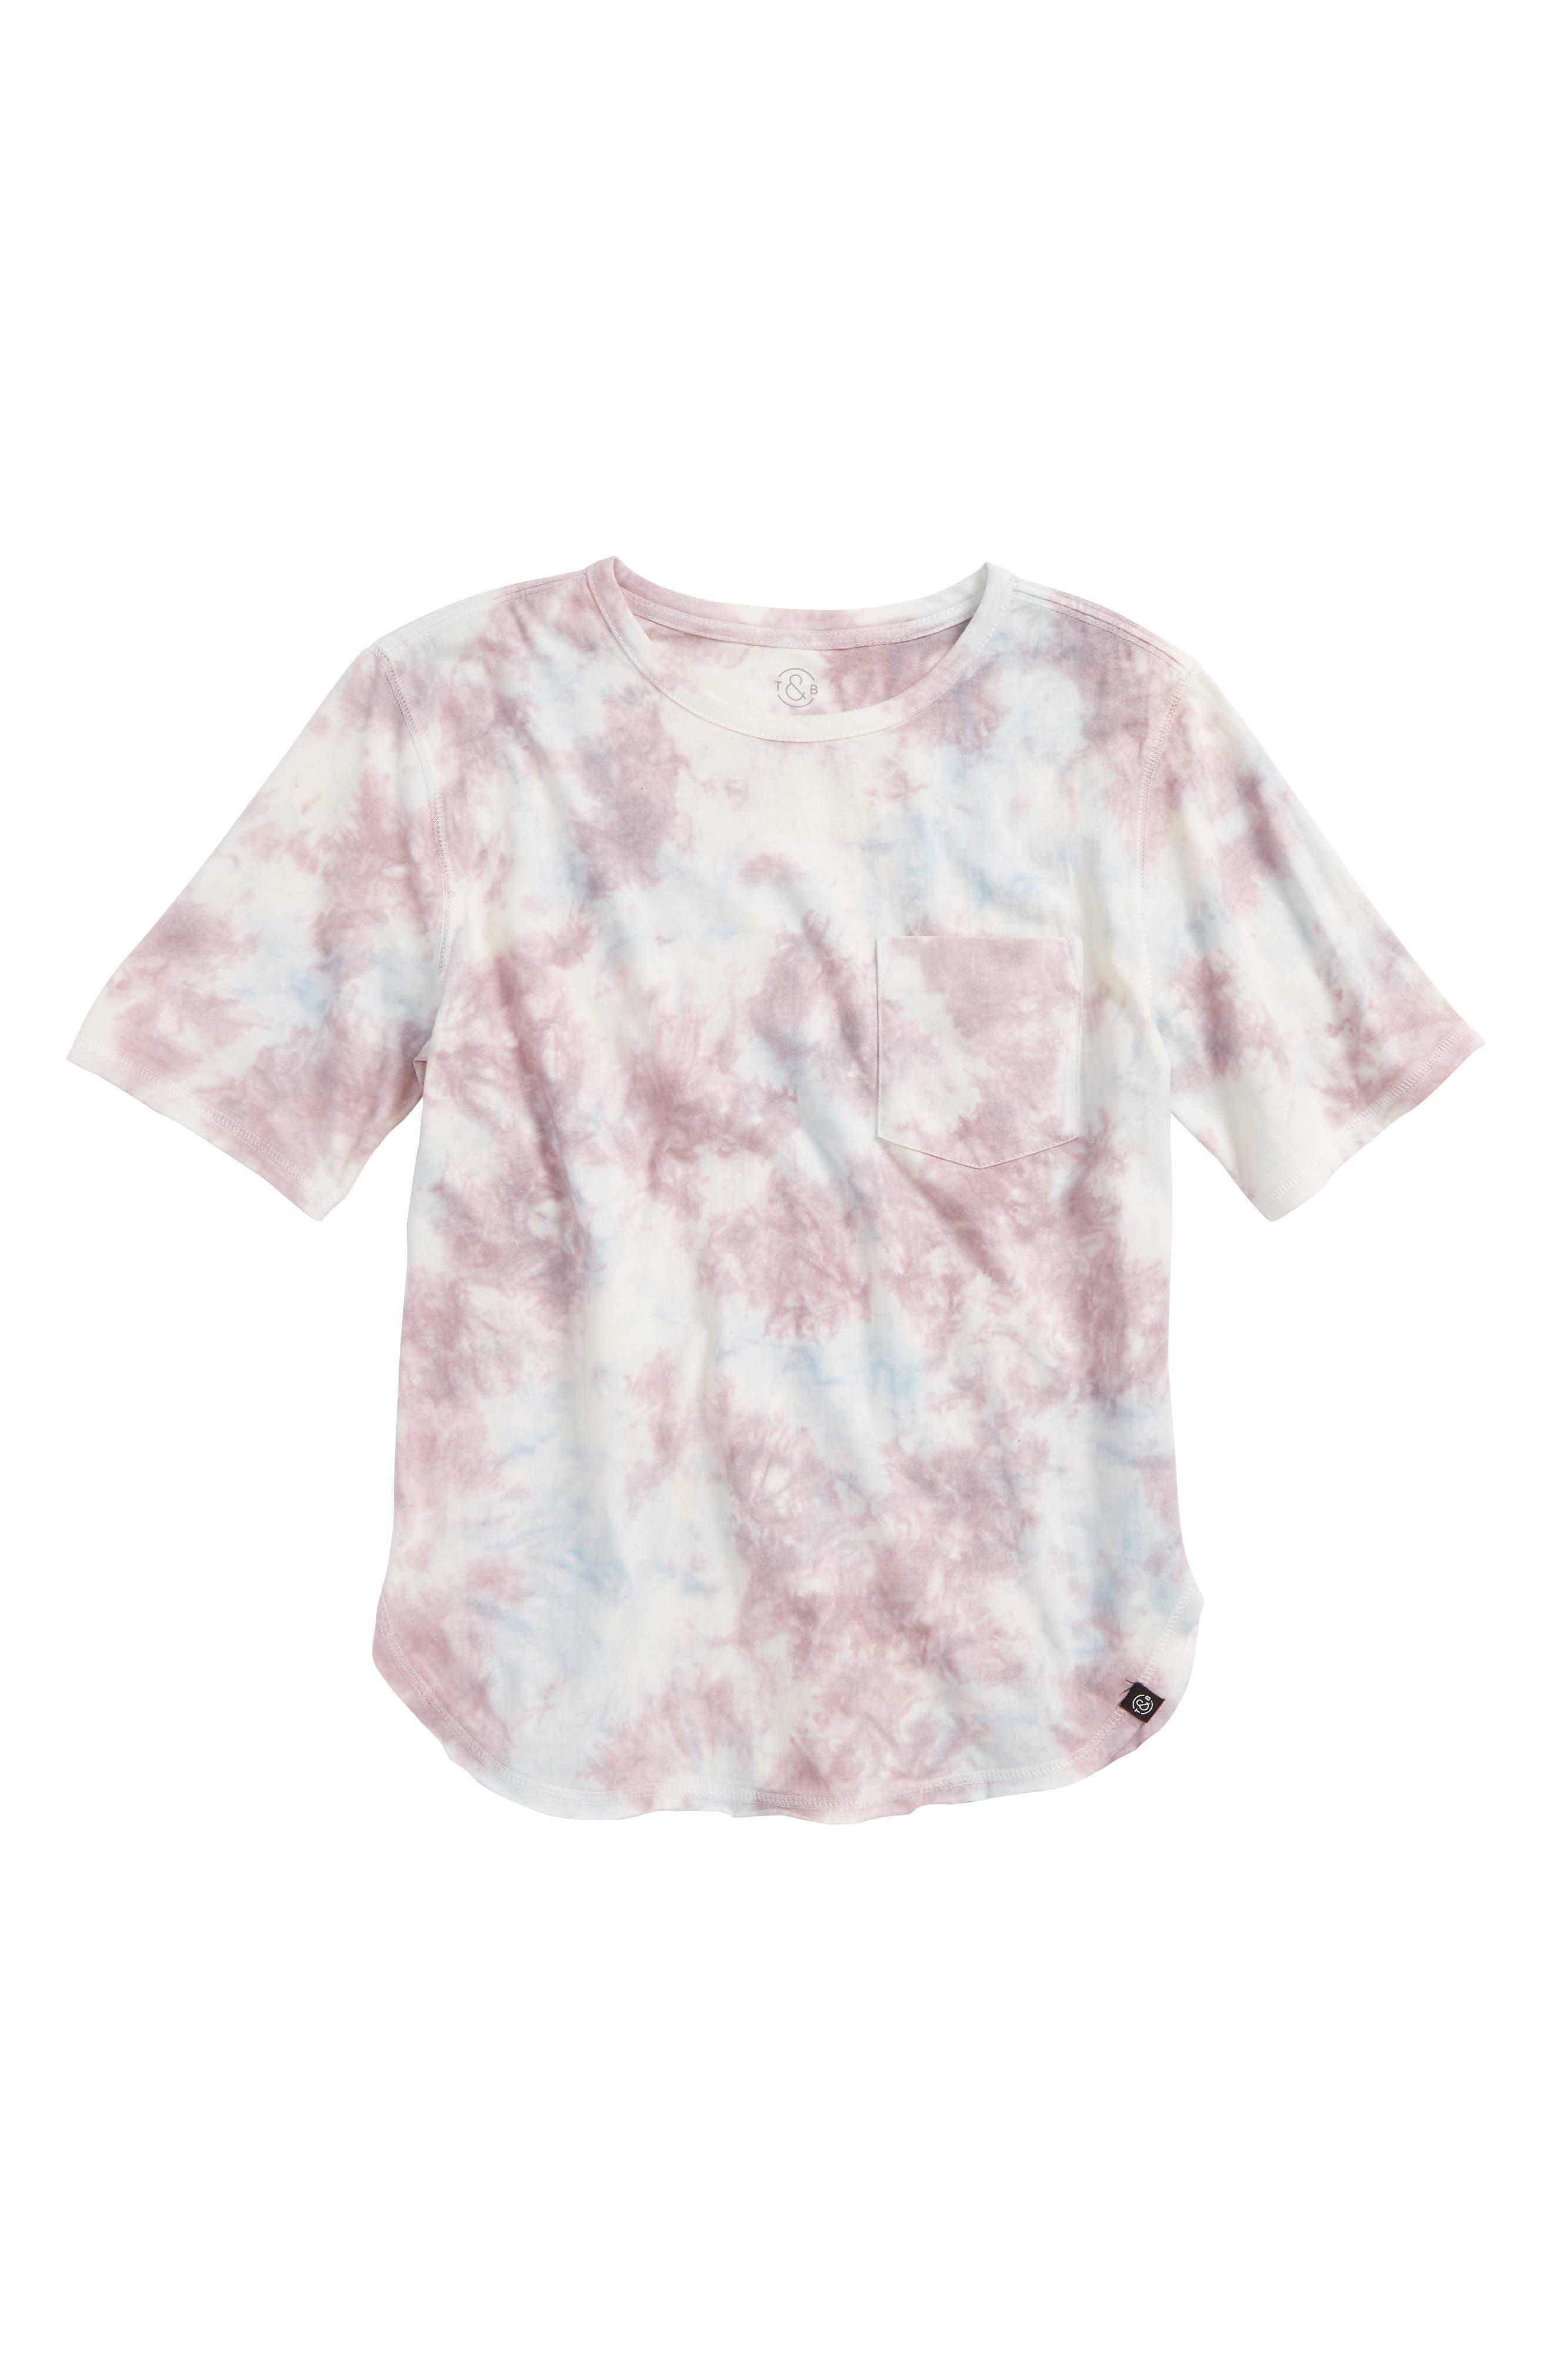 TREASURE & BOND,                             Tie Dye T-Shirt,                             Main thumbnail 1, color,                             900